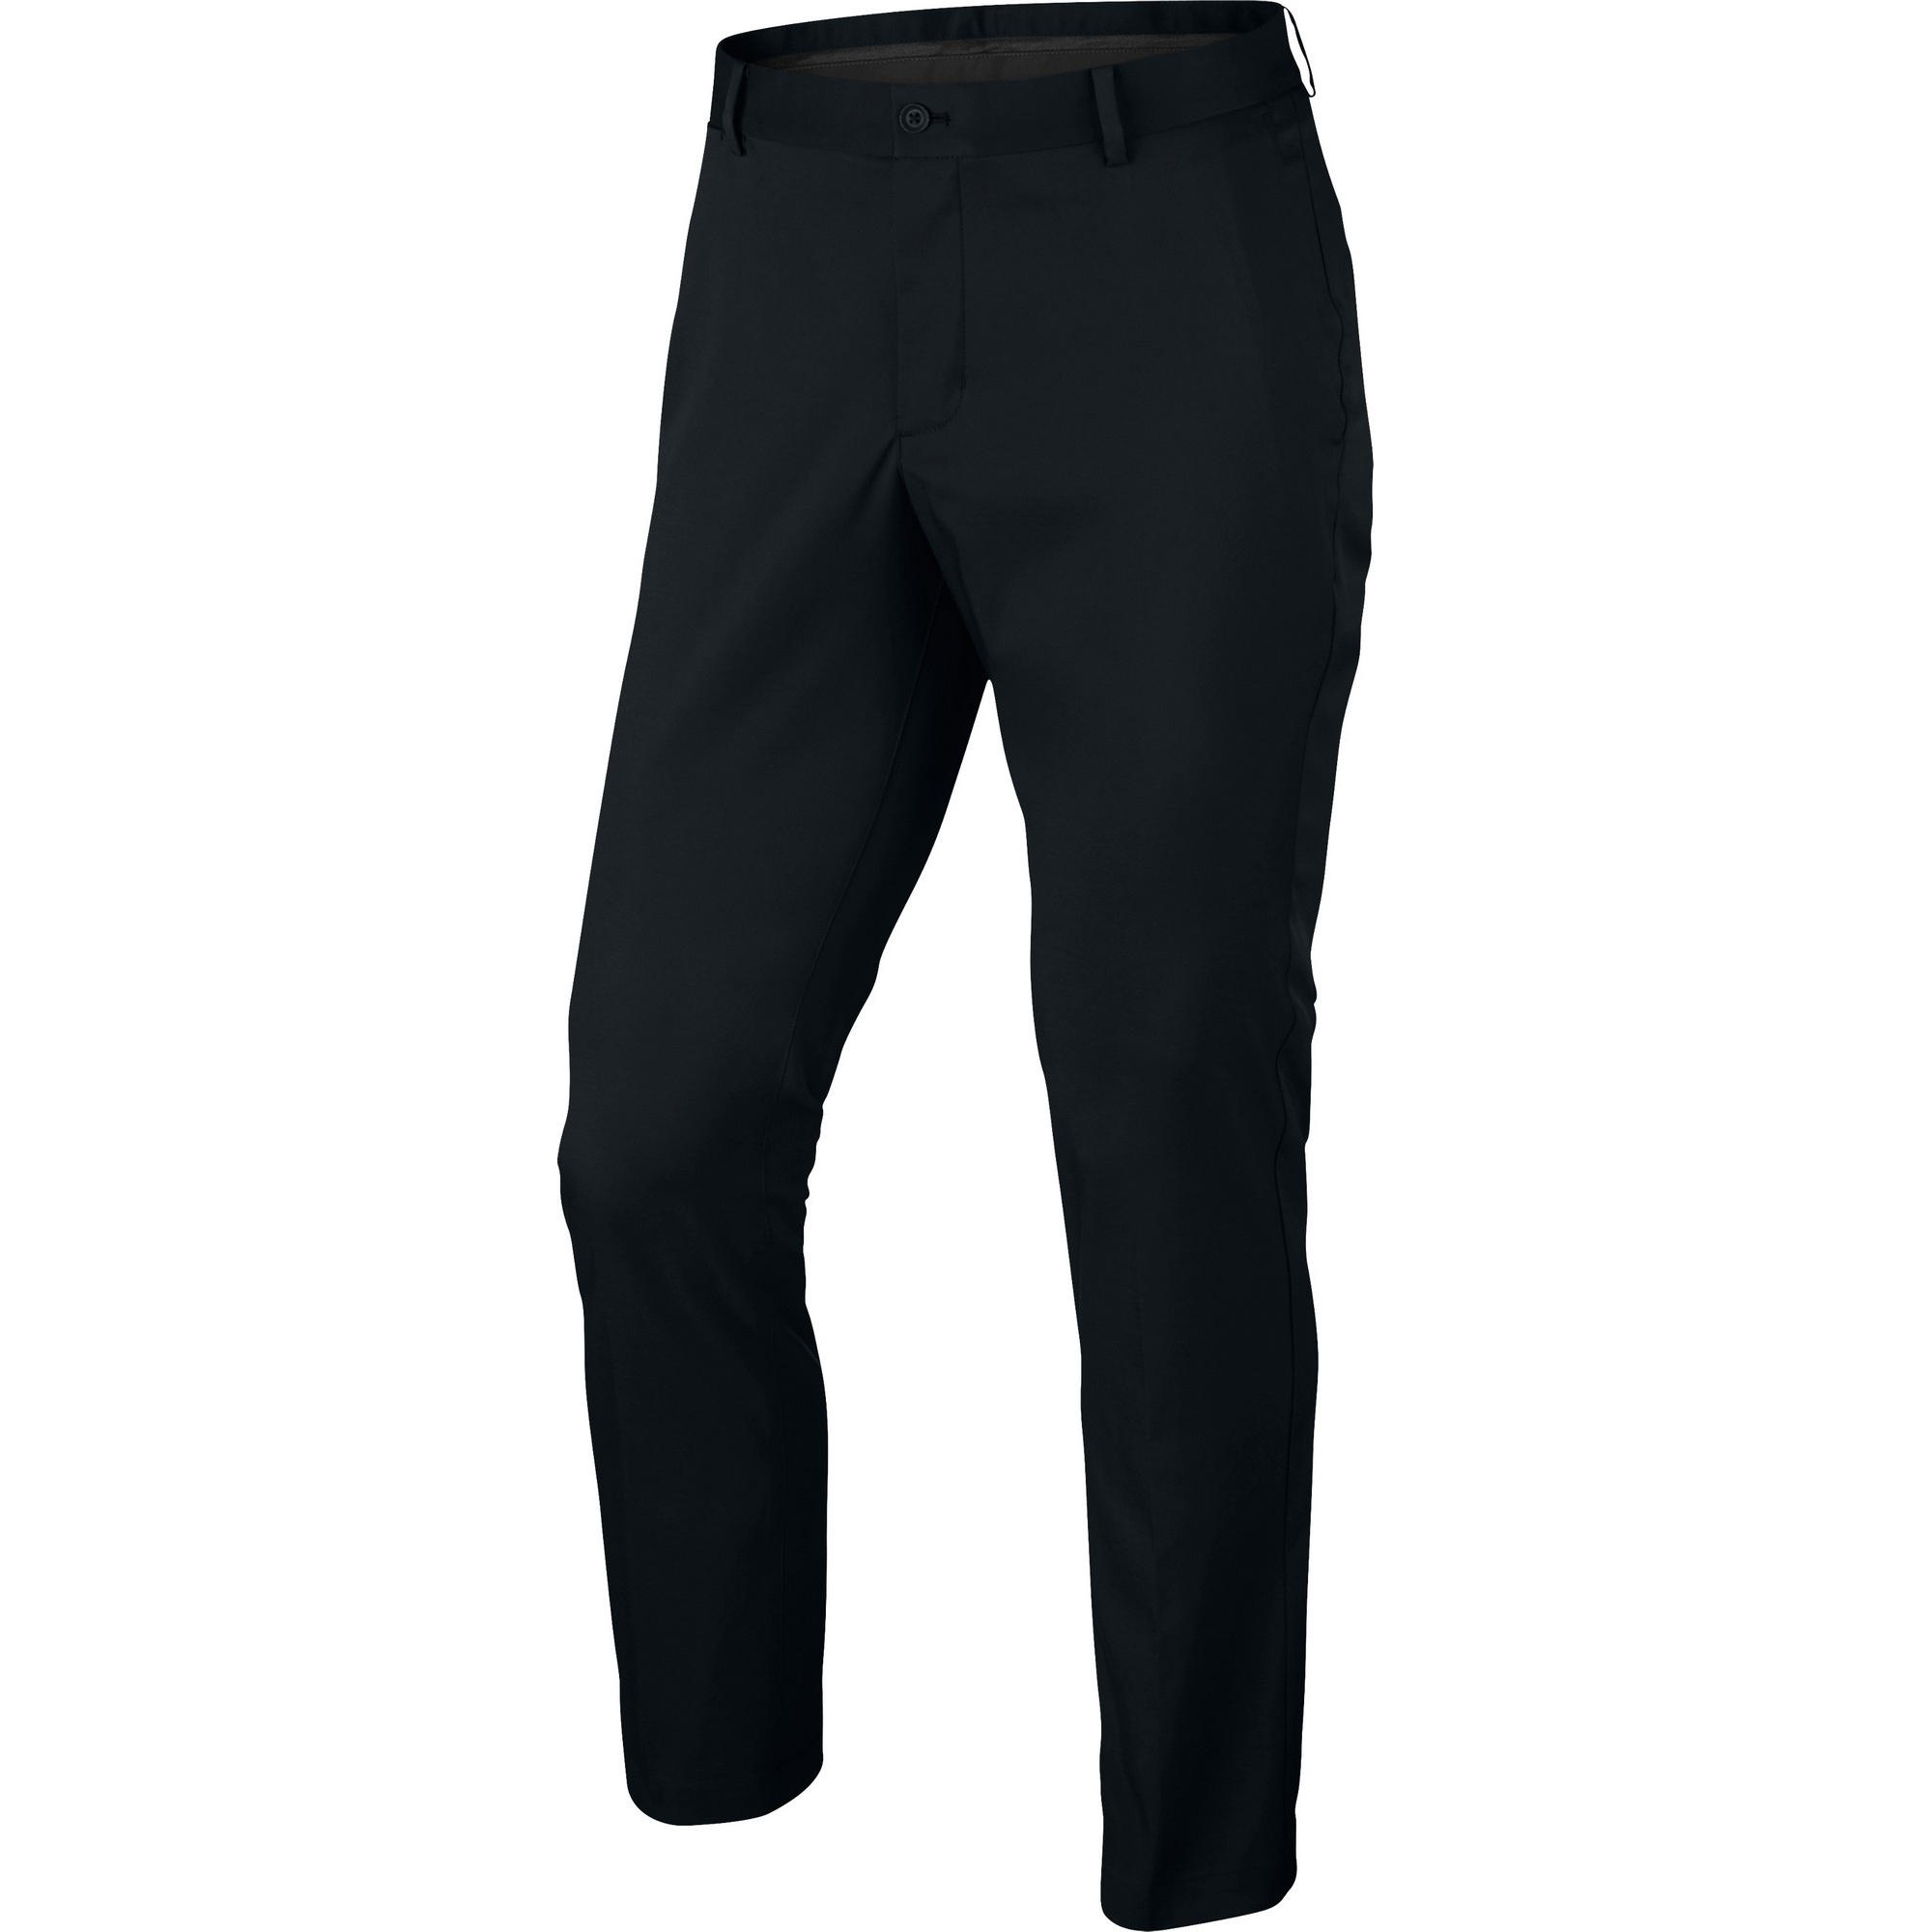 Nike Mens Modern Fit Breathable Trousers (38S) (Black/Black)